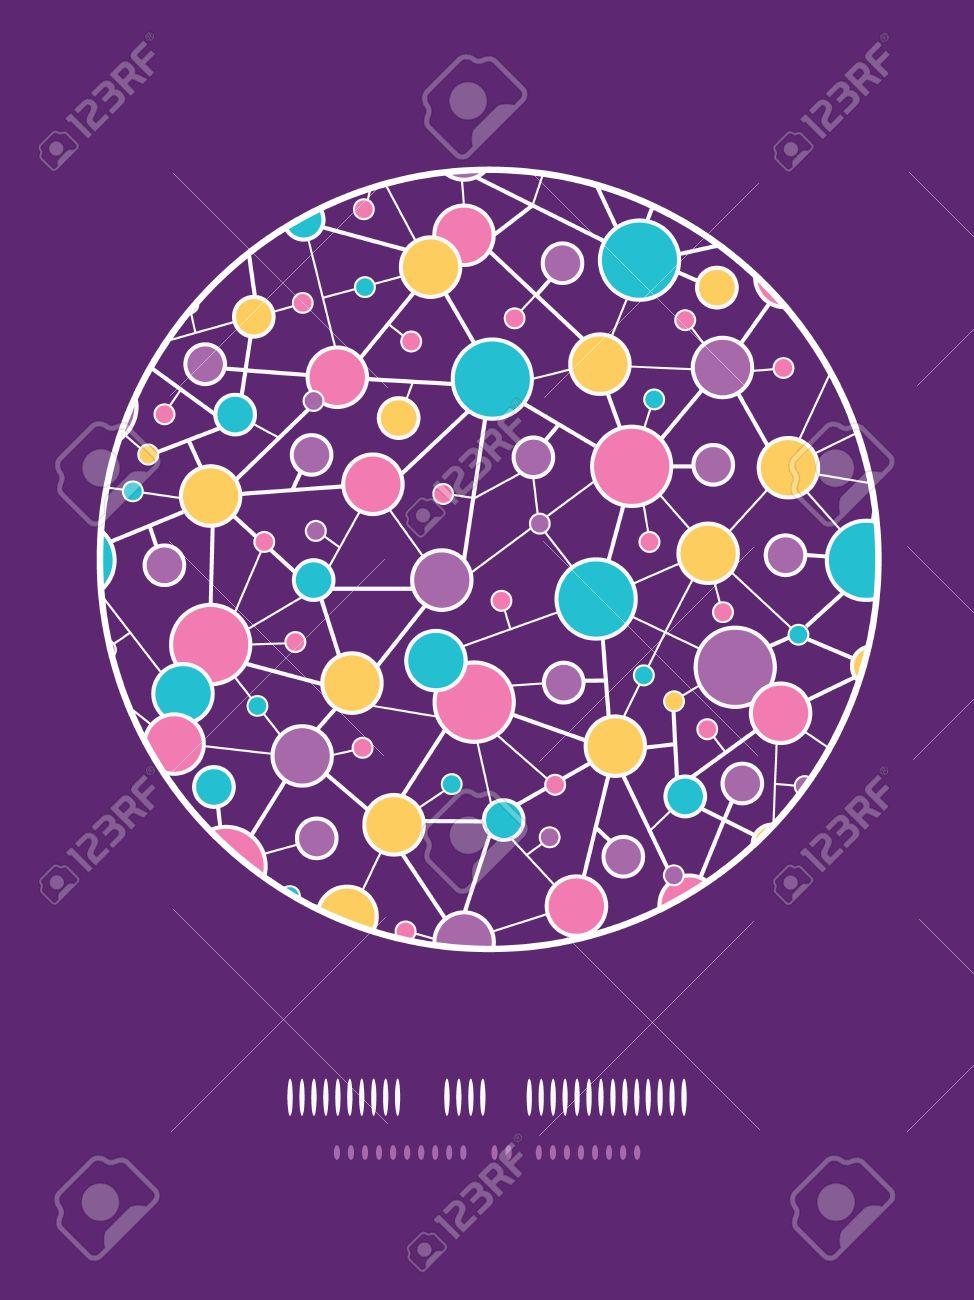 Molecular Structure Circle Seamless Pattern background - 18011785